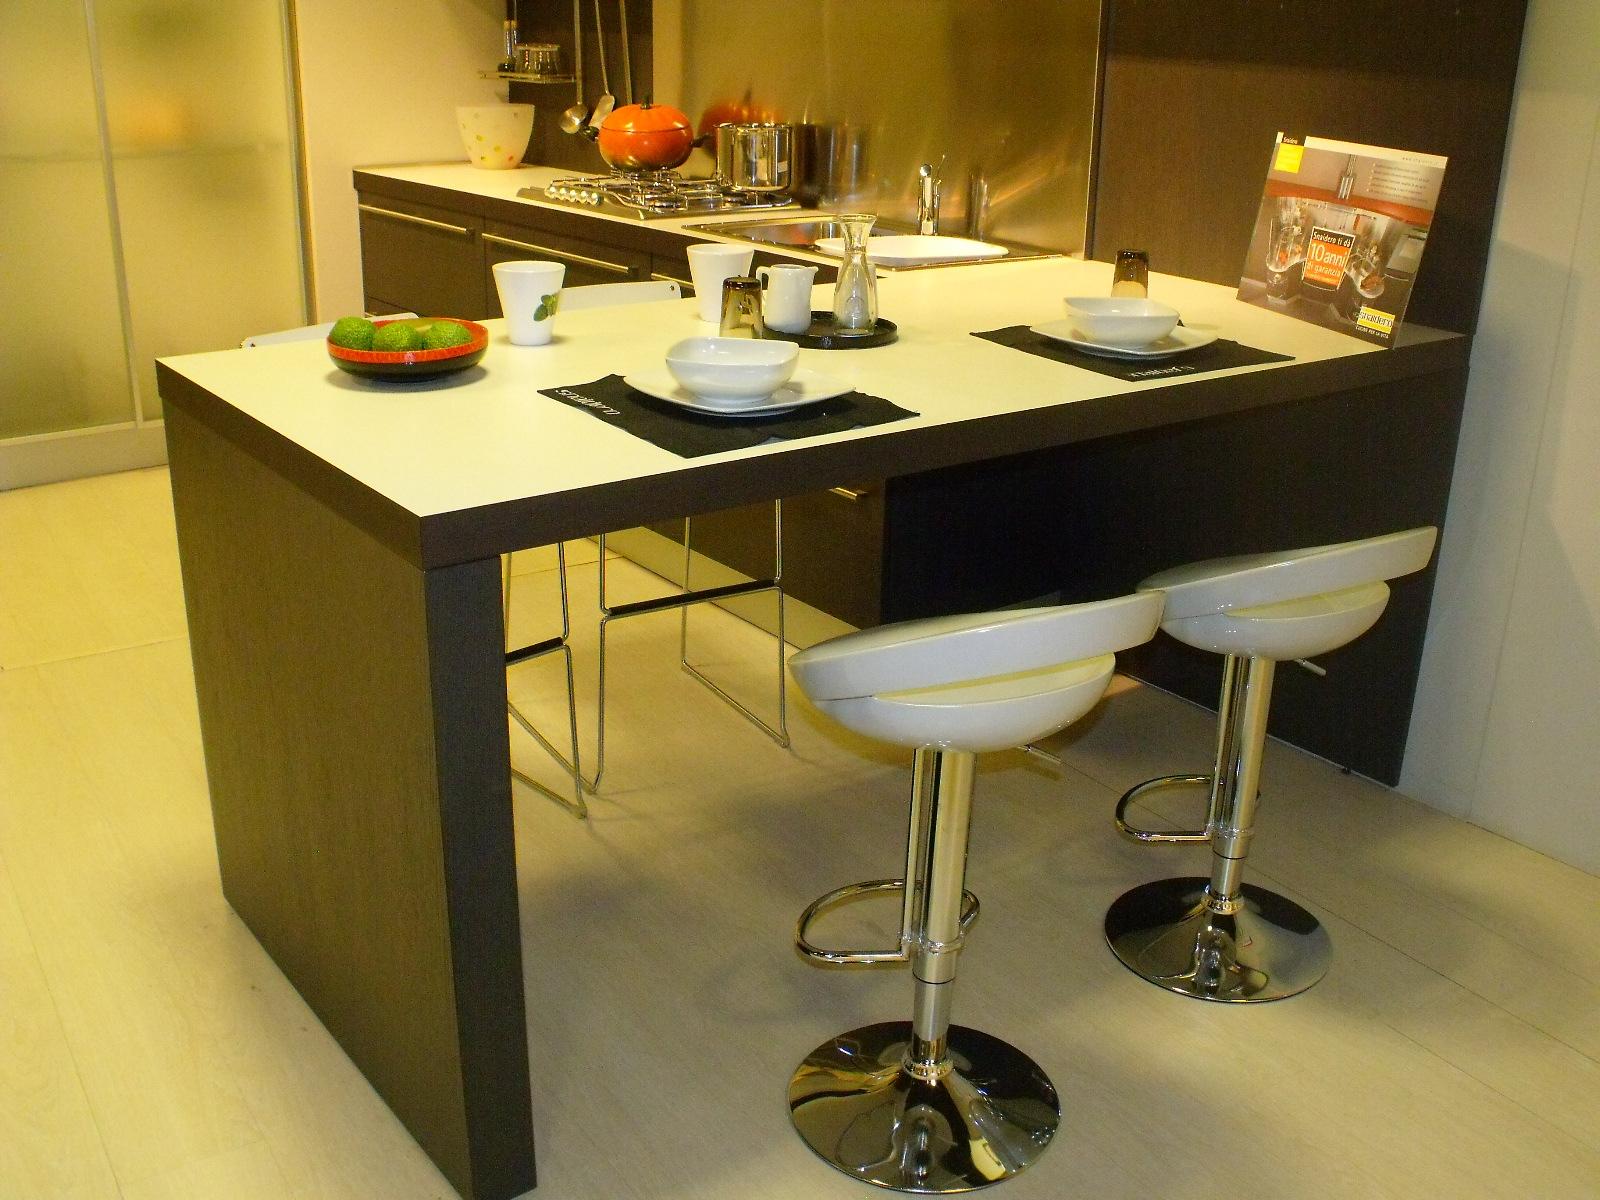 Cucina Snaidero Sistema zeta Moderna Legno - Cucine a prezzi scontati